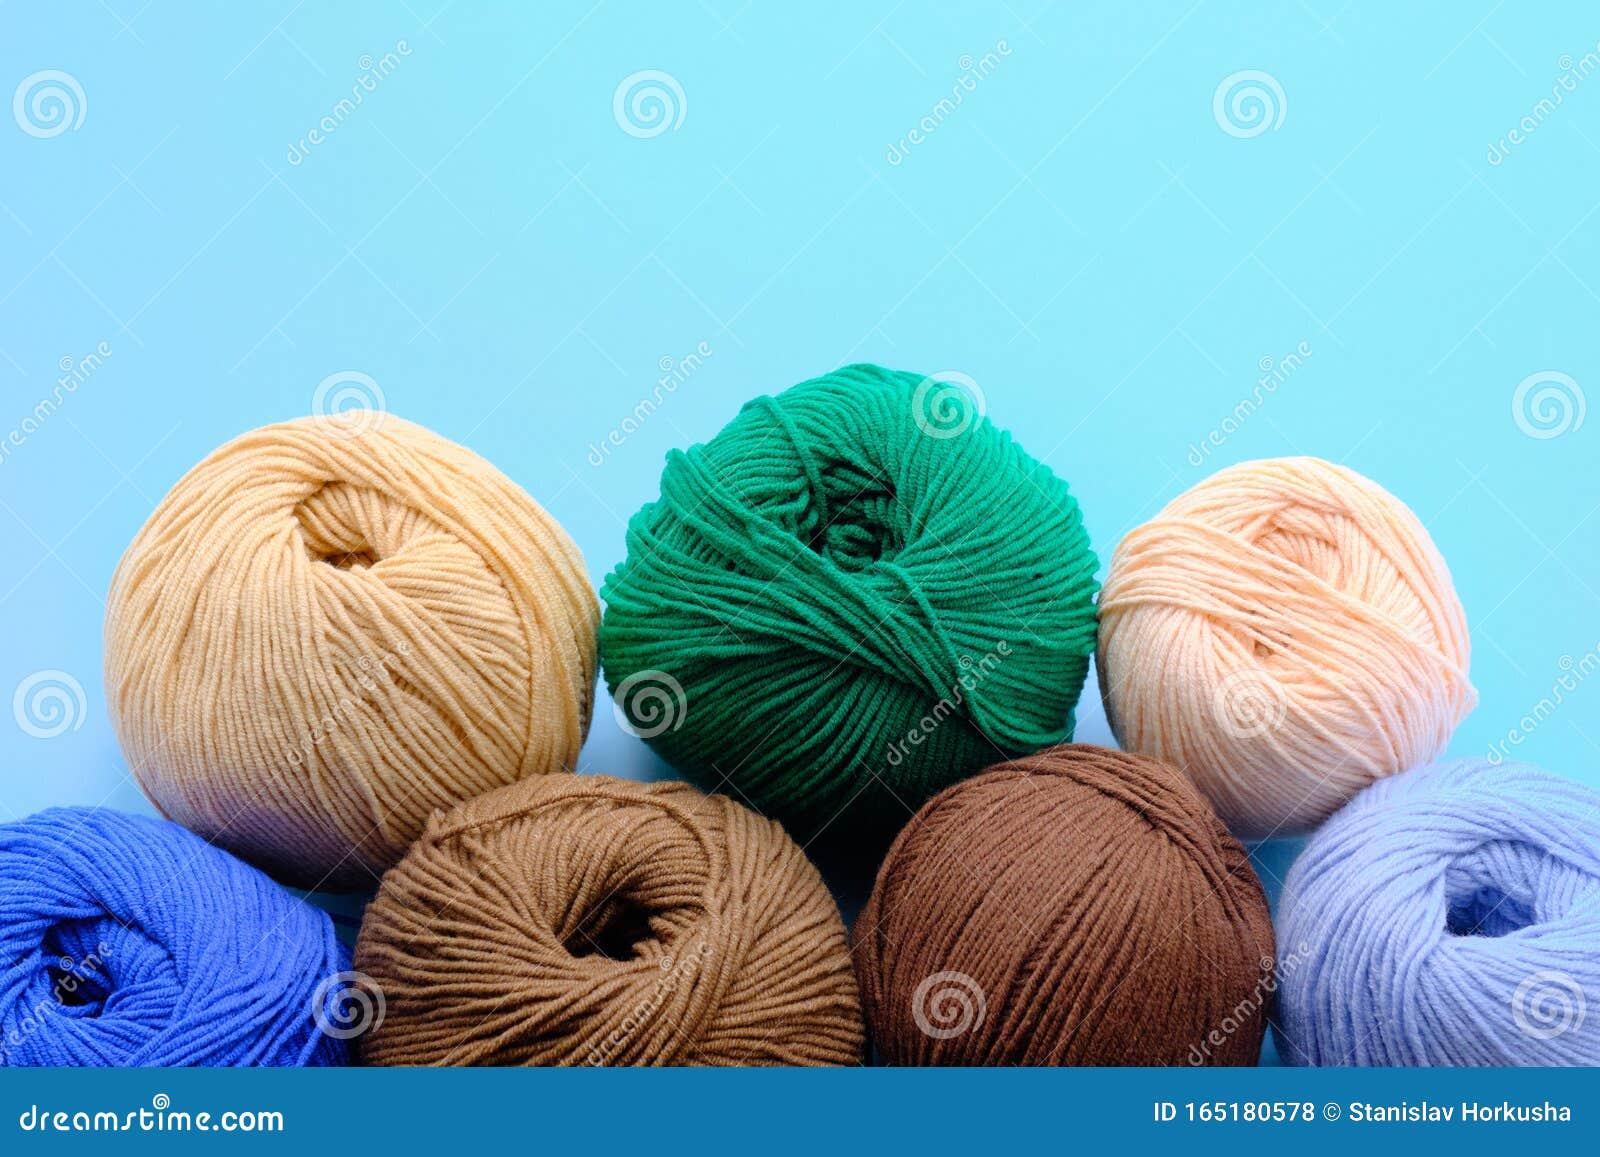 How to change yarn color in amigurumi   Crochet tutorial   lilleliis   1156x1600